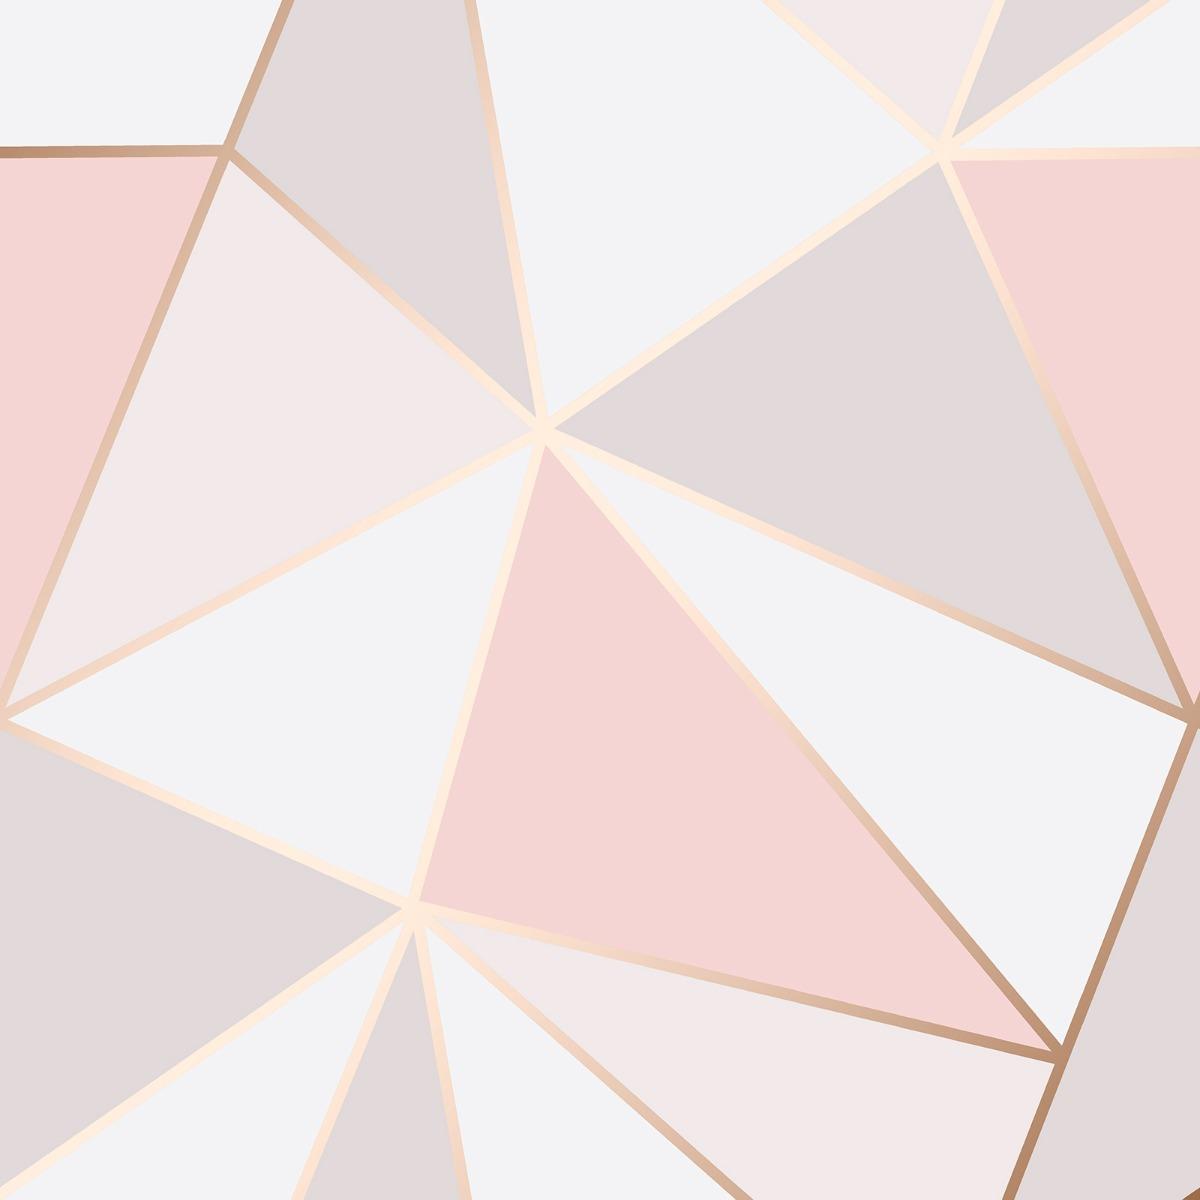 Rose Gold Wallpaper Trend